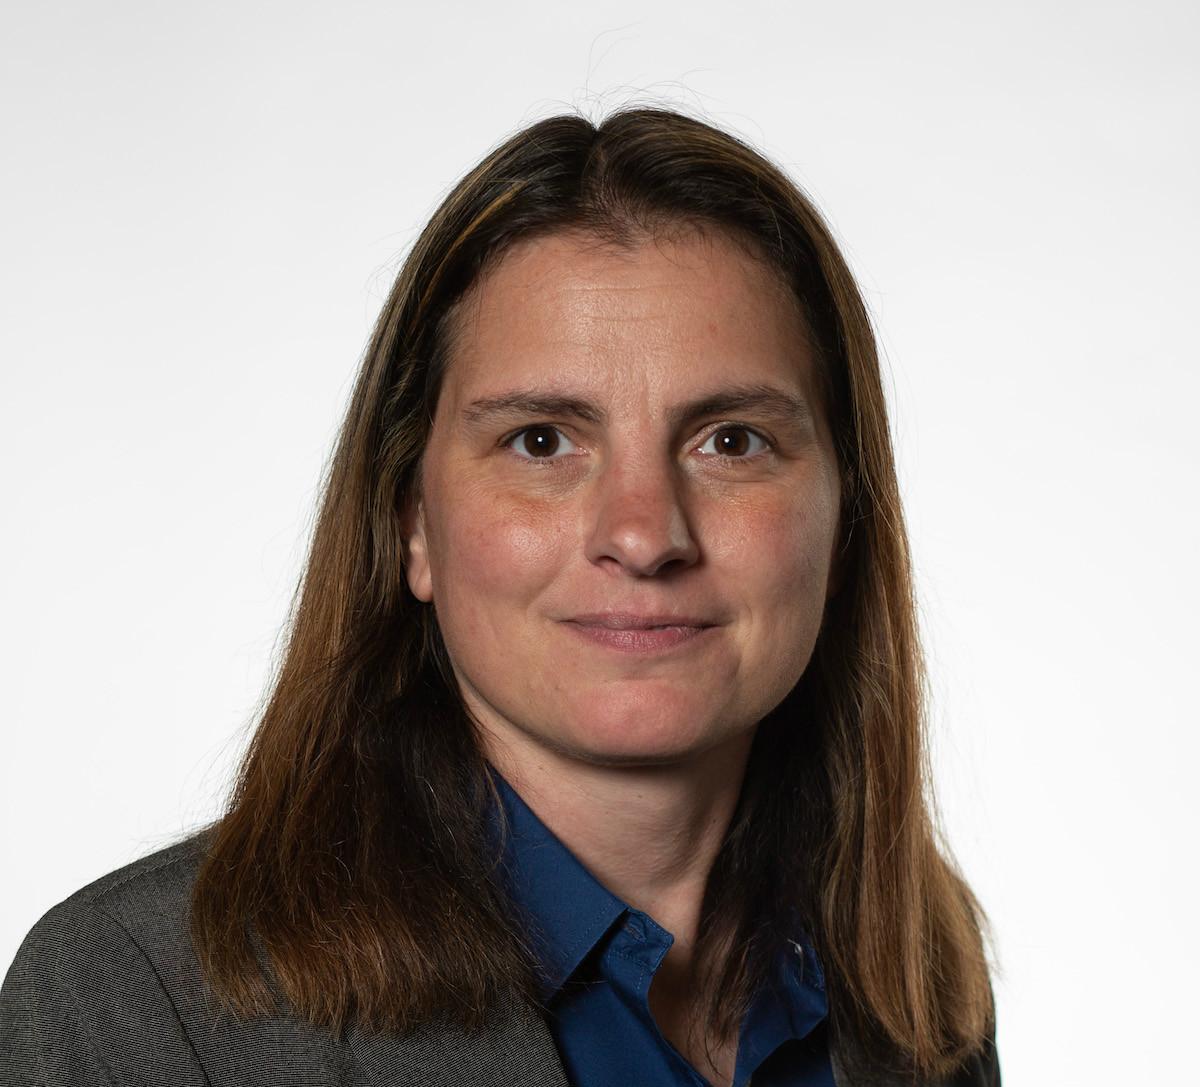 Tillman Scholar Jennie Callahan